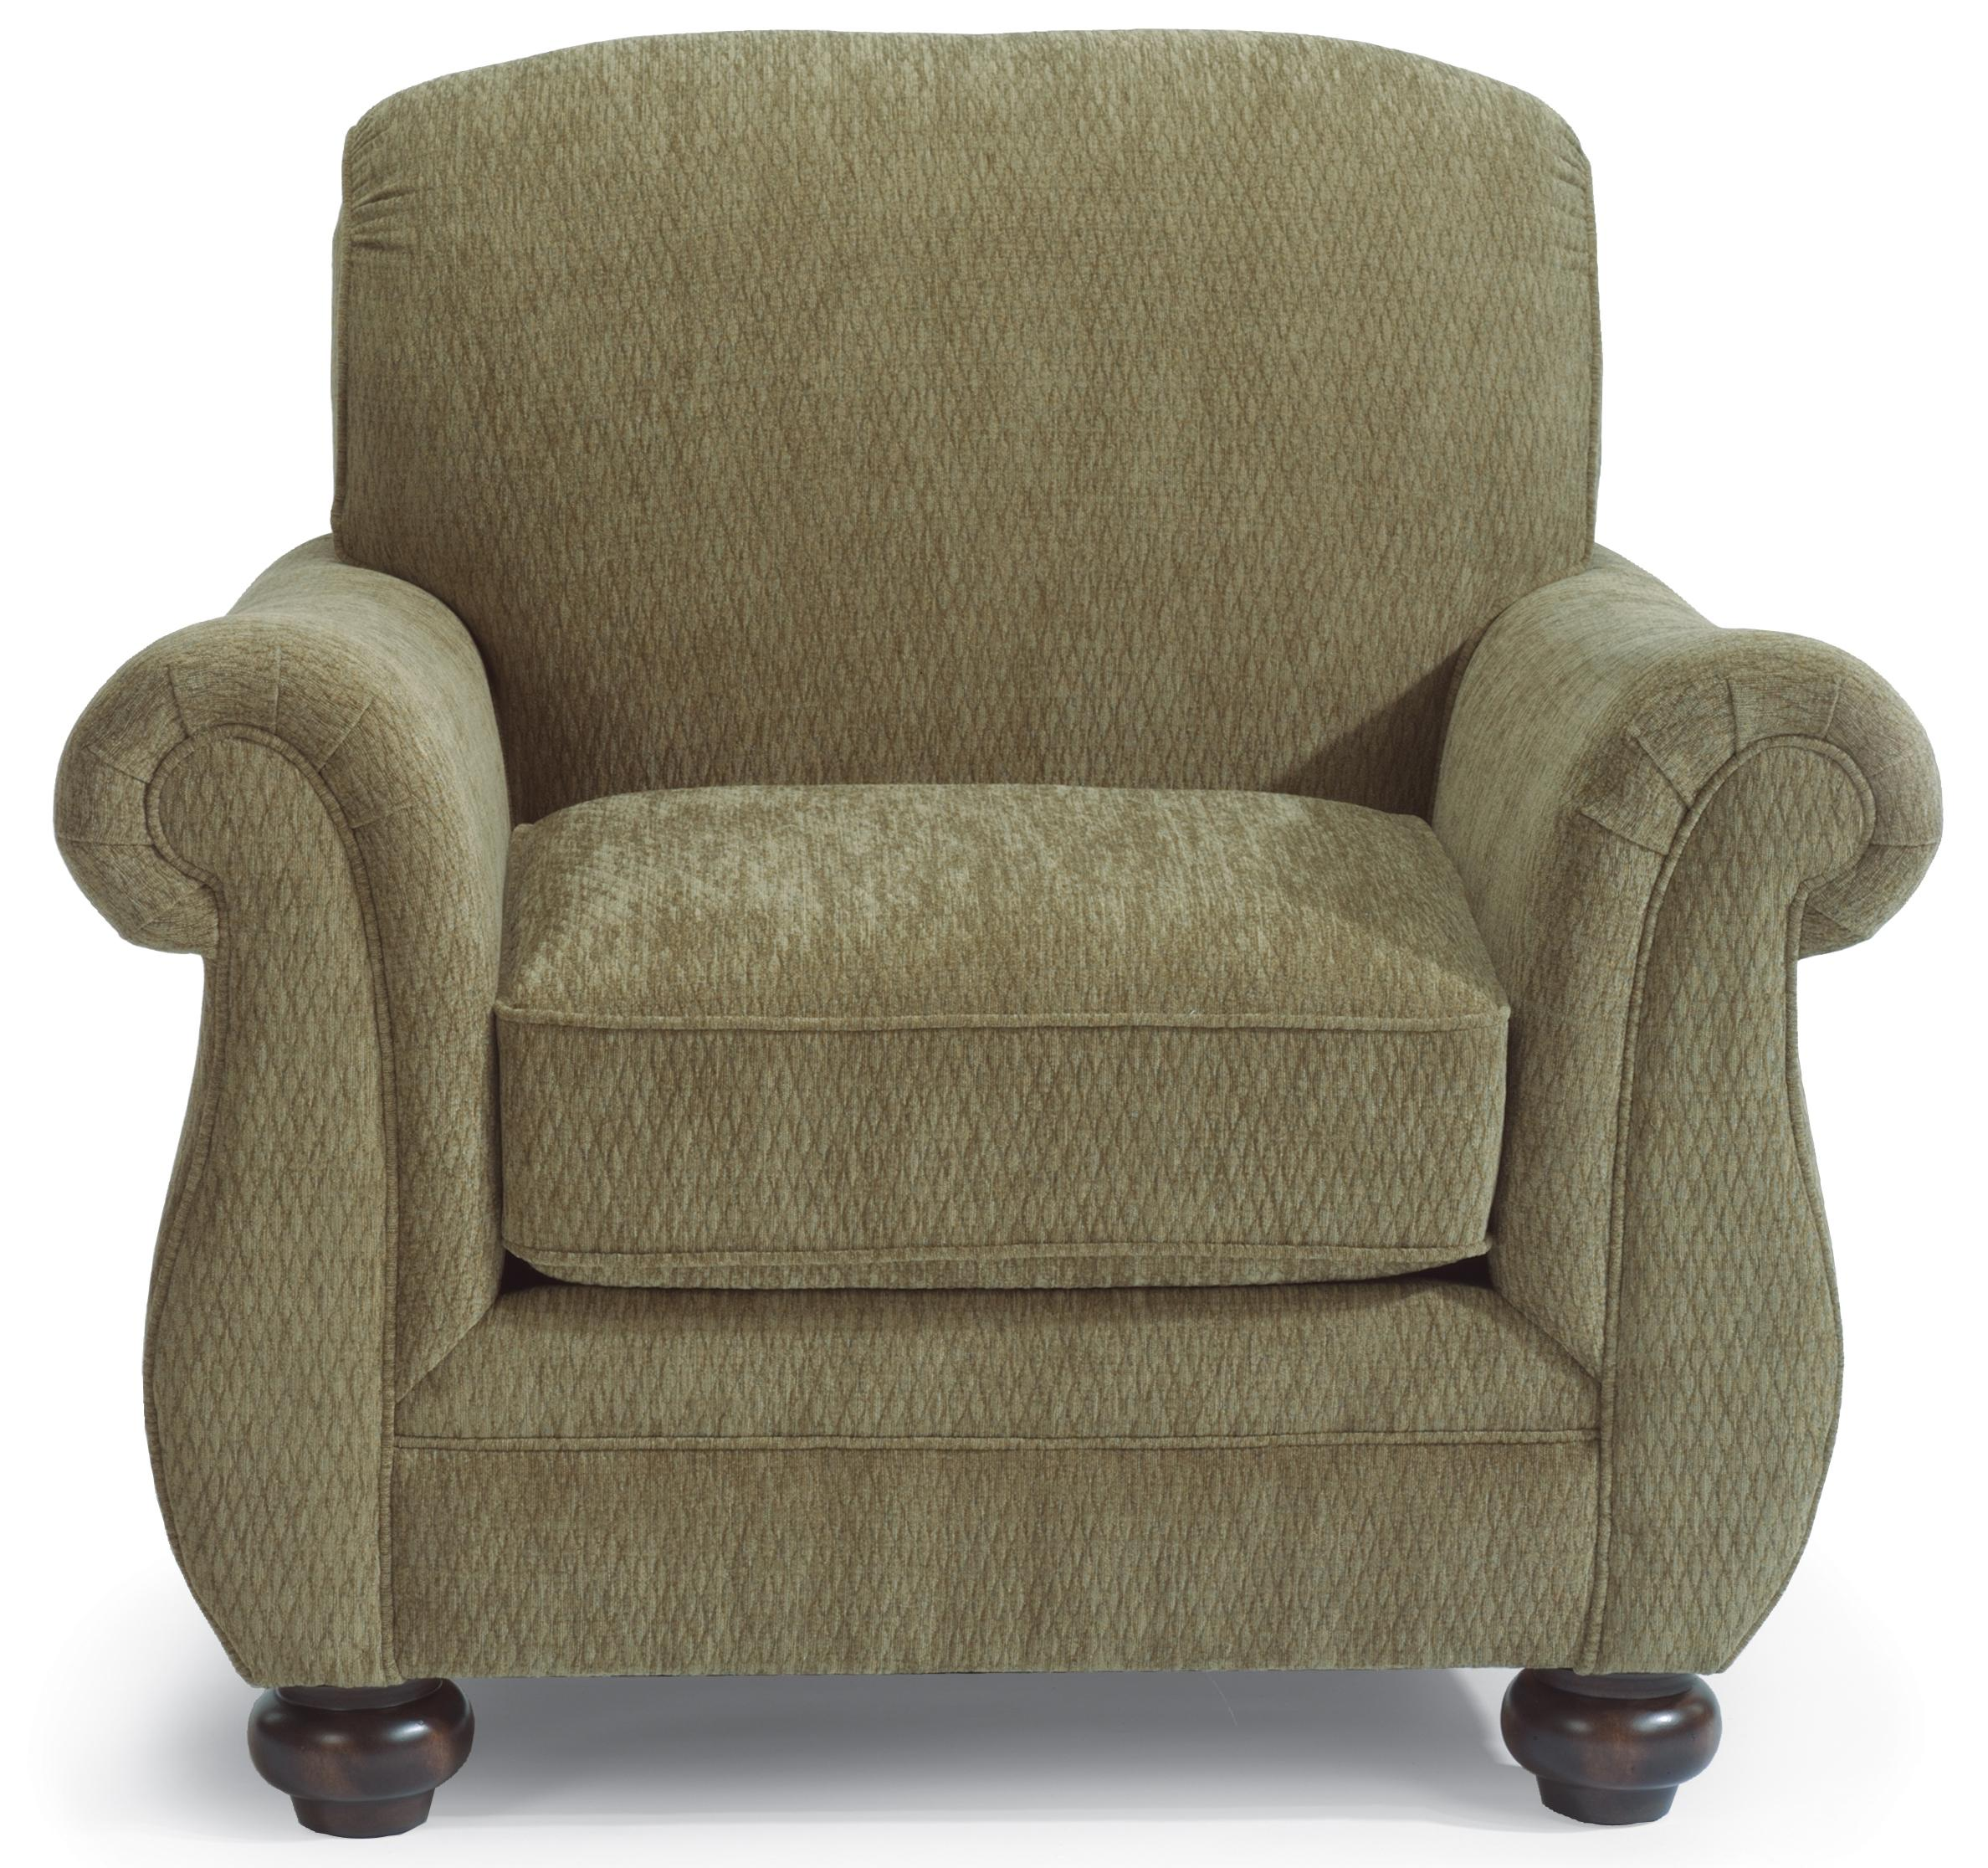 Flexsteel Winston Arm Chair - Item Number: 5997-10